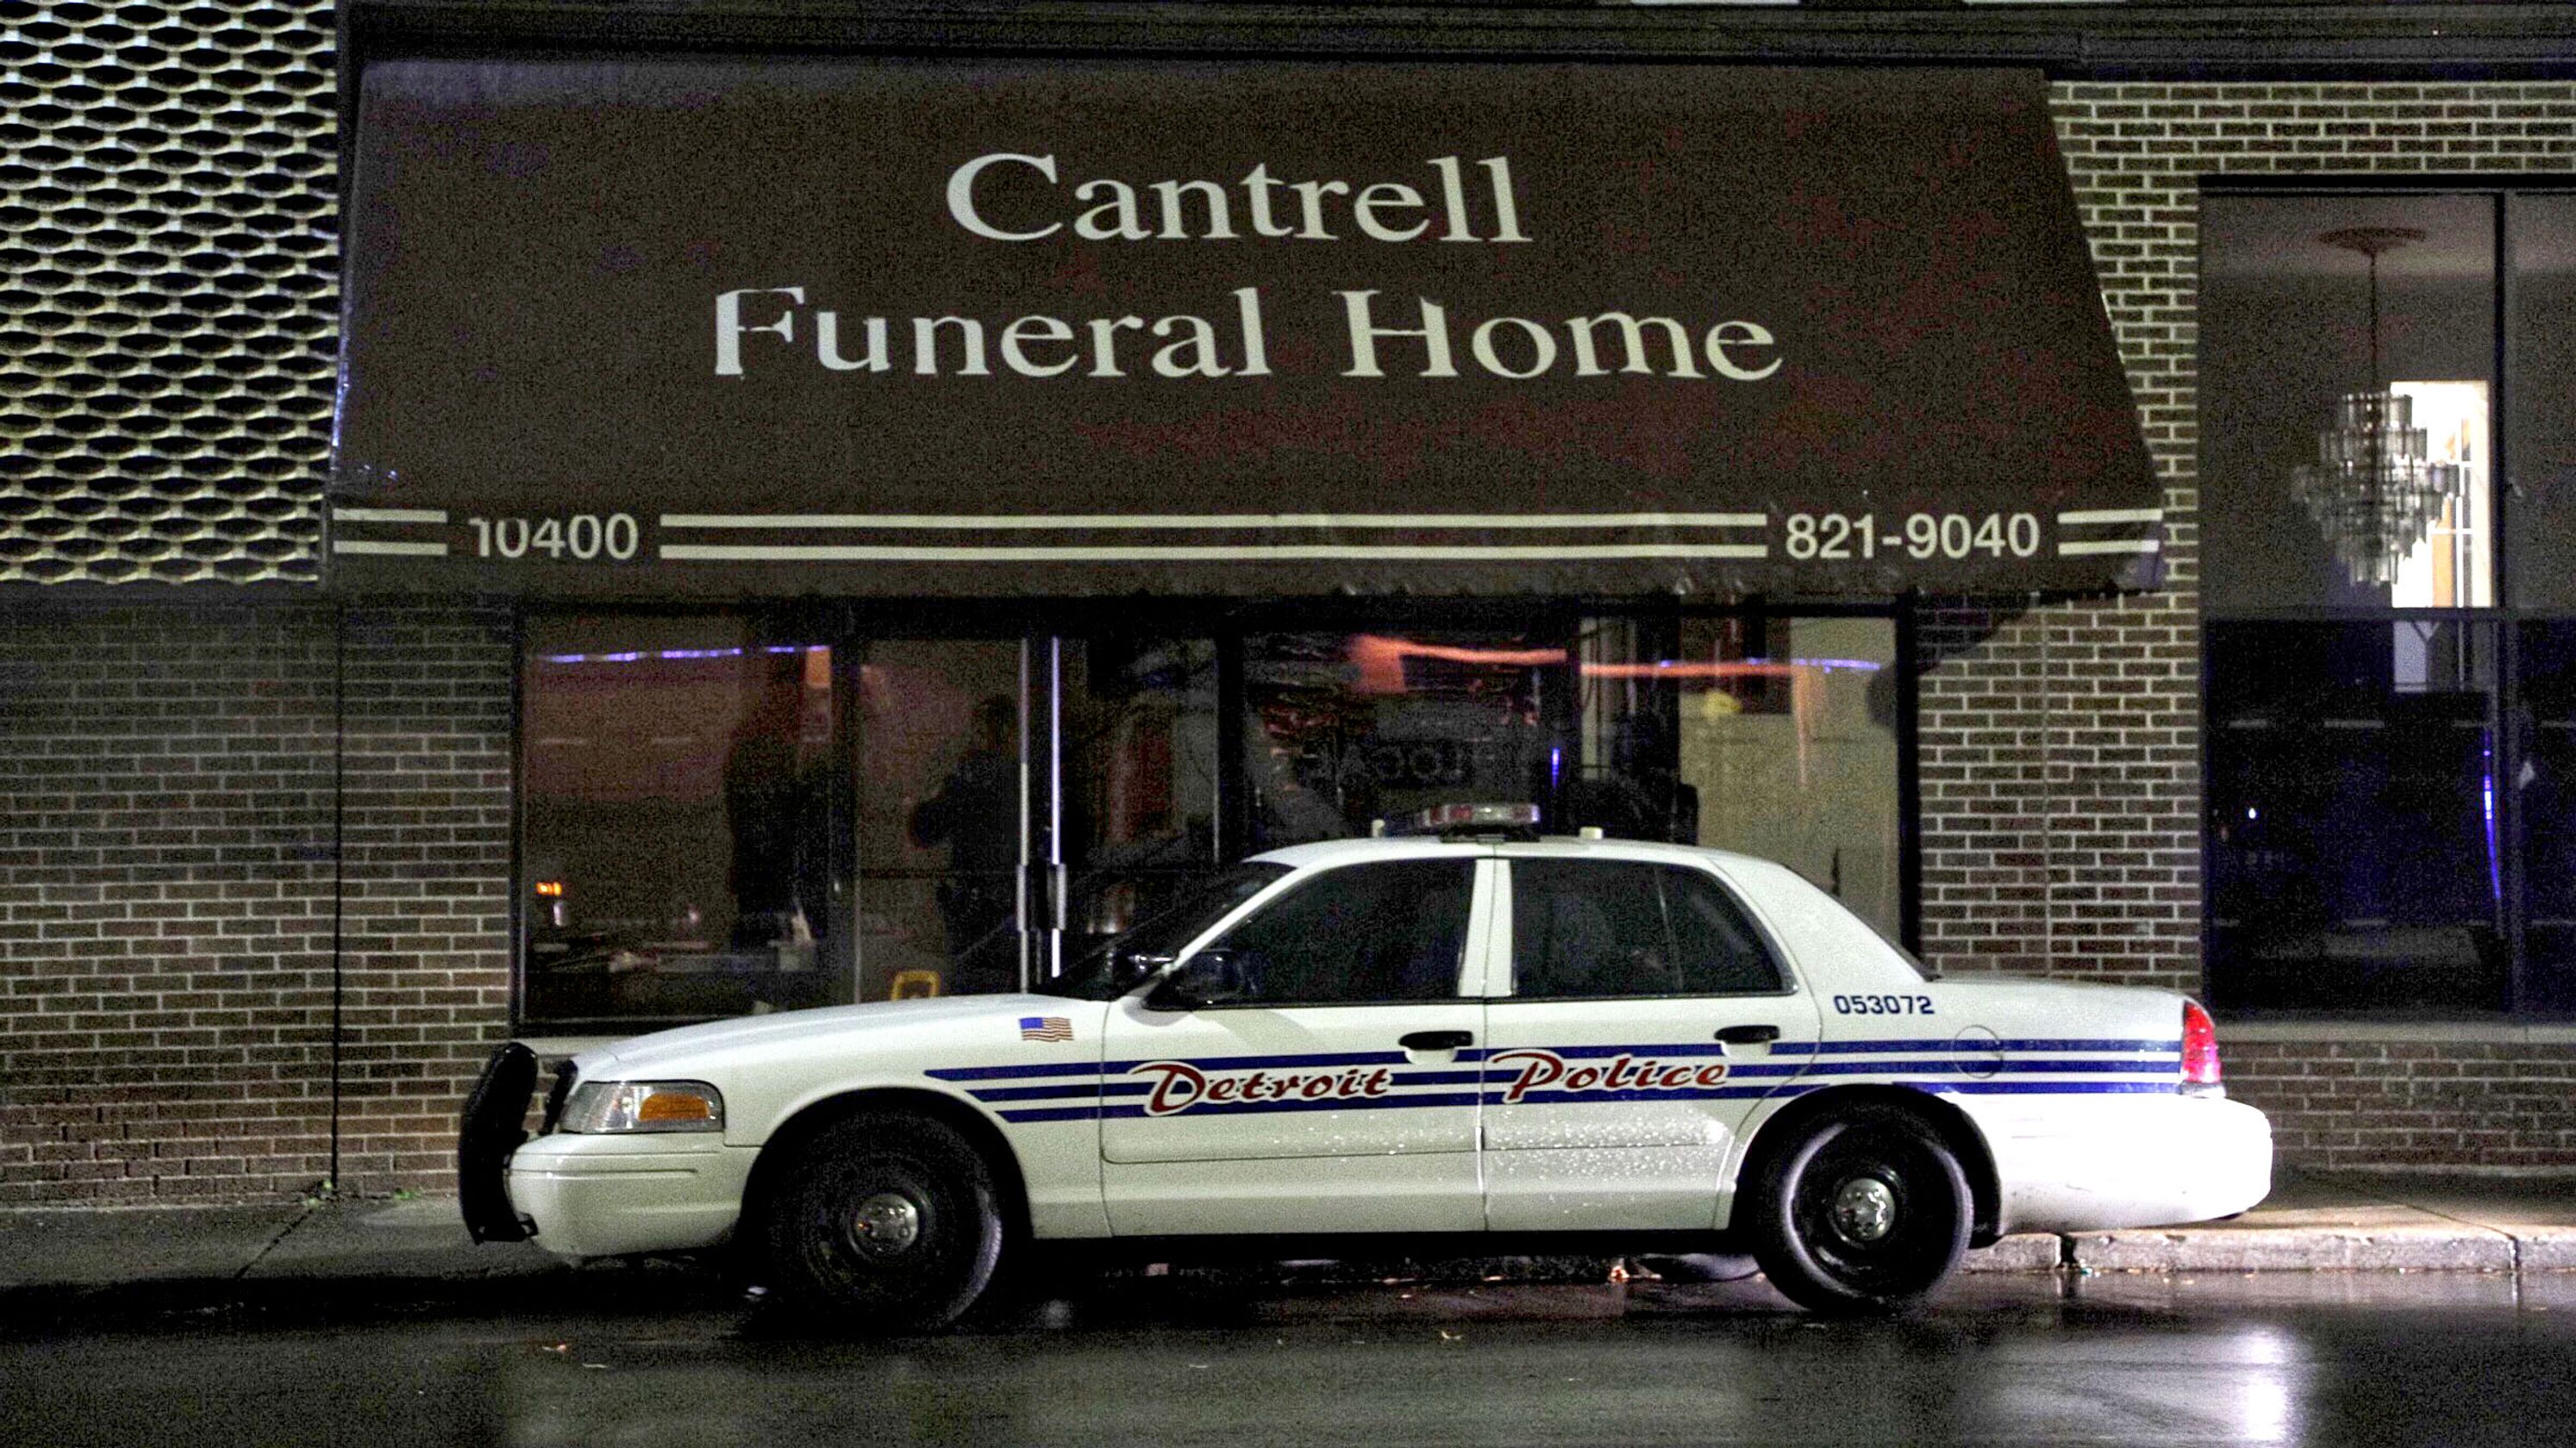 d0bcc2df-d472-4a2d-9b50-181e5d625017-Cantrell_Funeral_Home.jpg